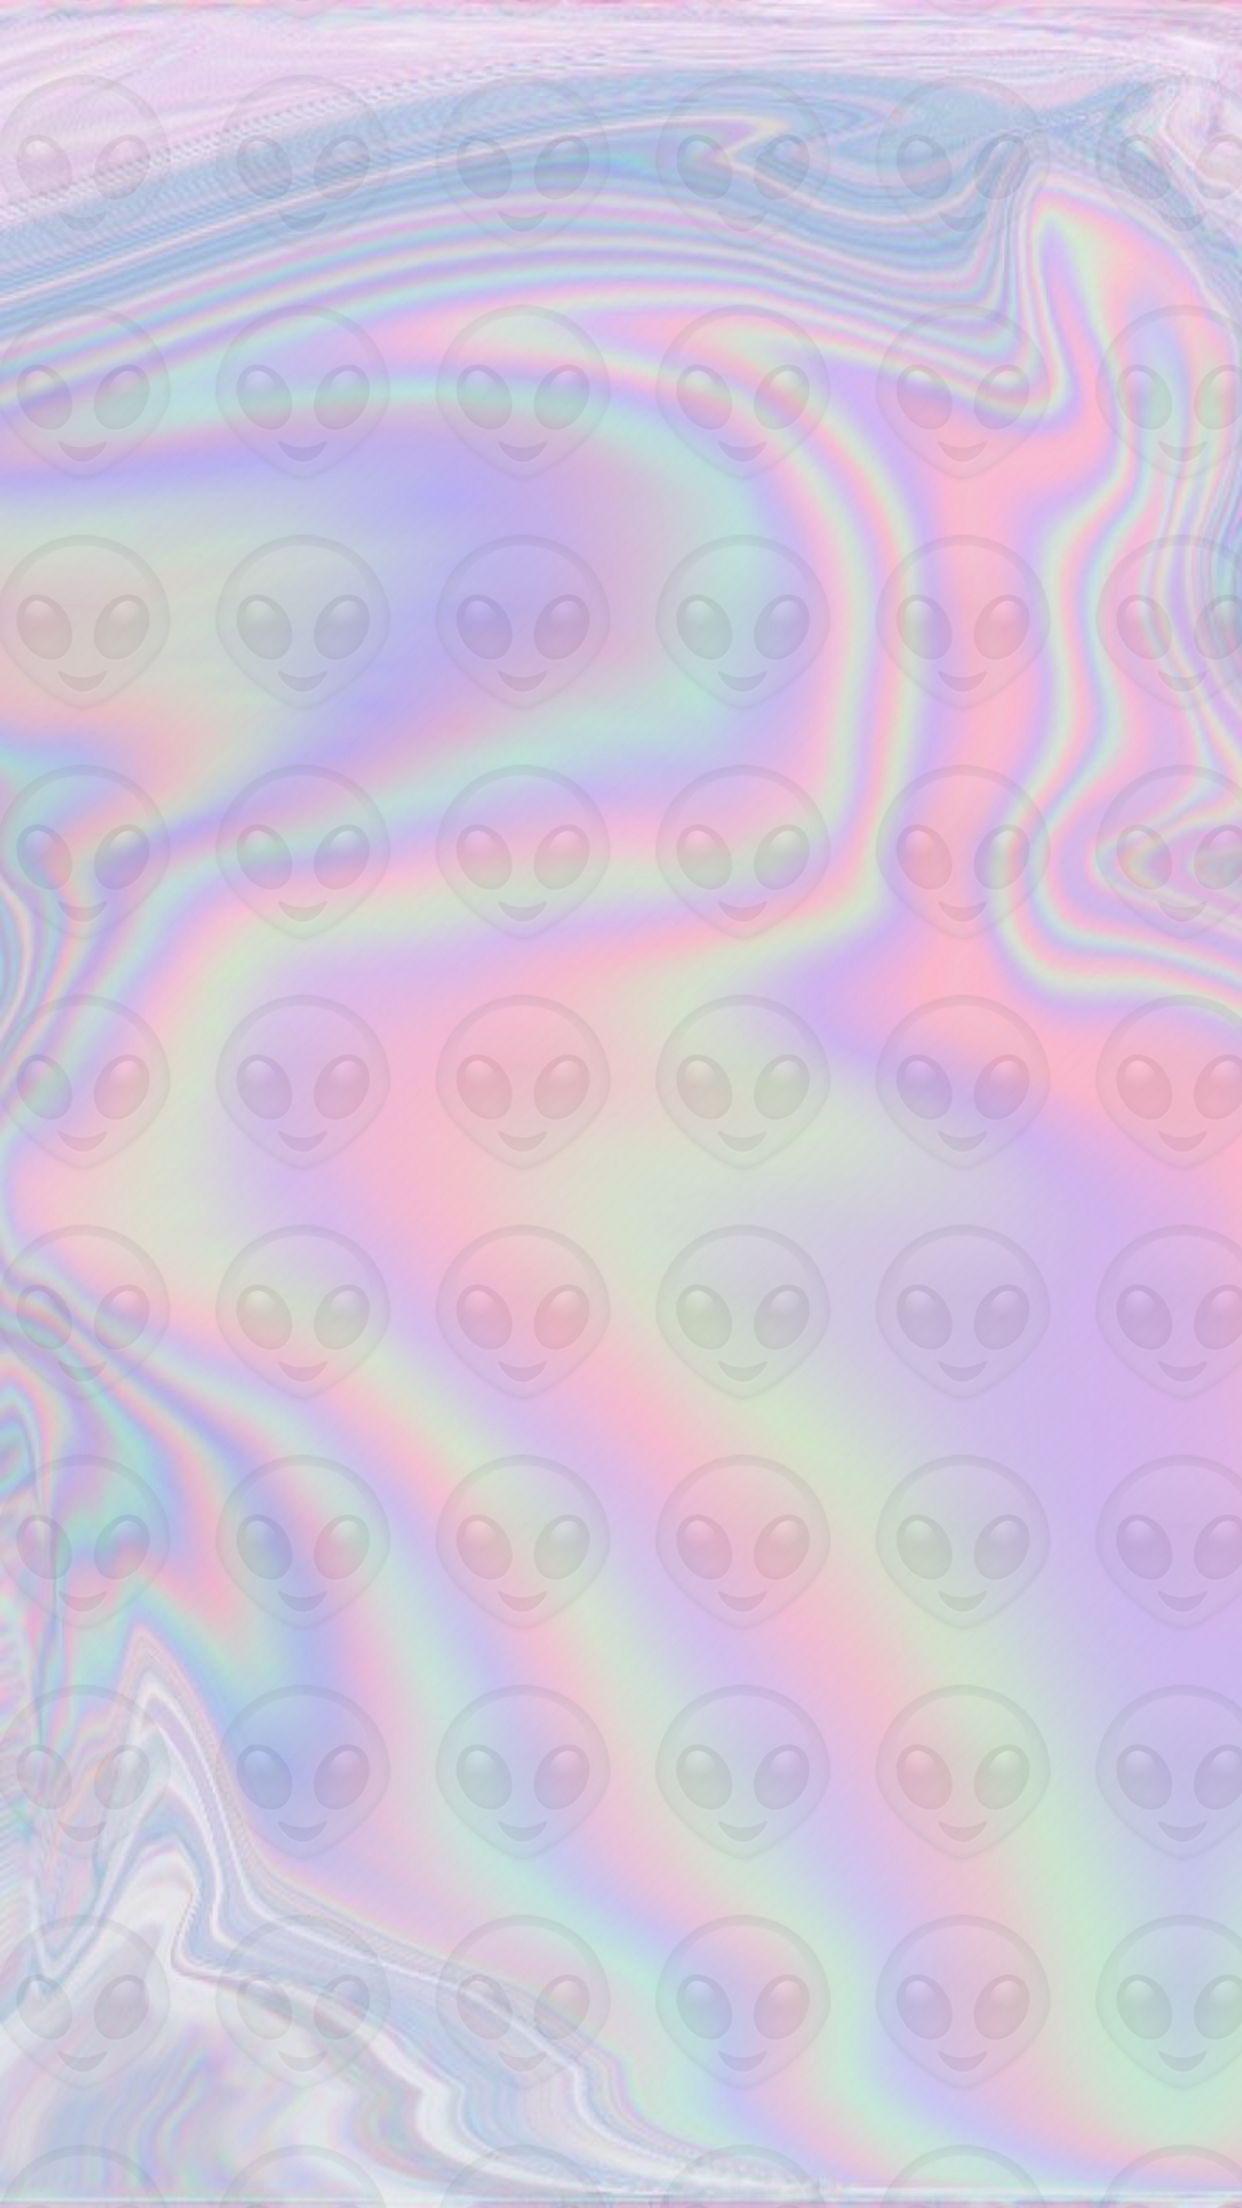 Alien Hologram Holograph Holographic Iridescent Emoji Wallpaper Wallpapers Background Ba Holographic Wallpapers Emoji Wallpaper Free Android Wallpaper